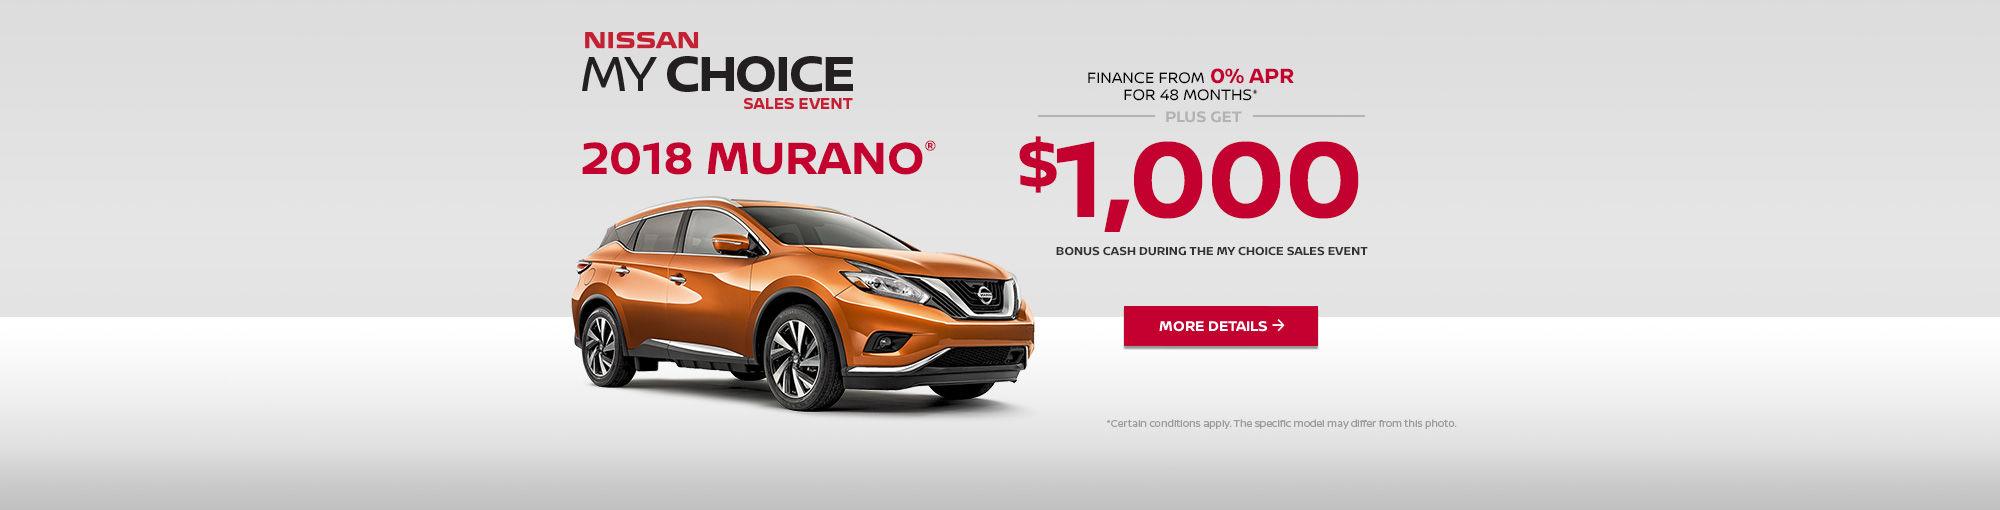 Nissan My Choice Sales Event - Murano (web)